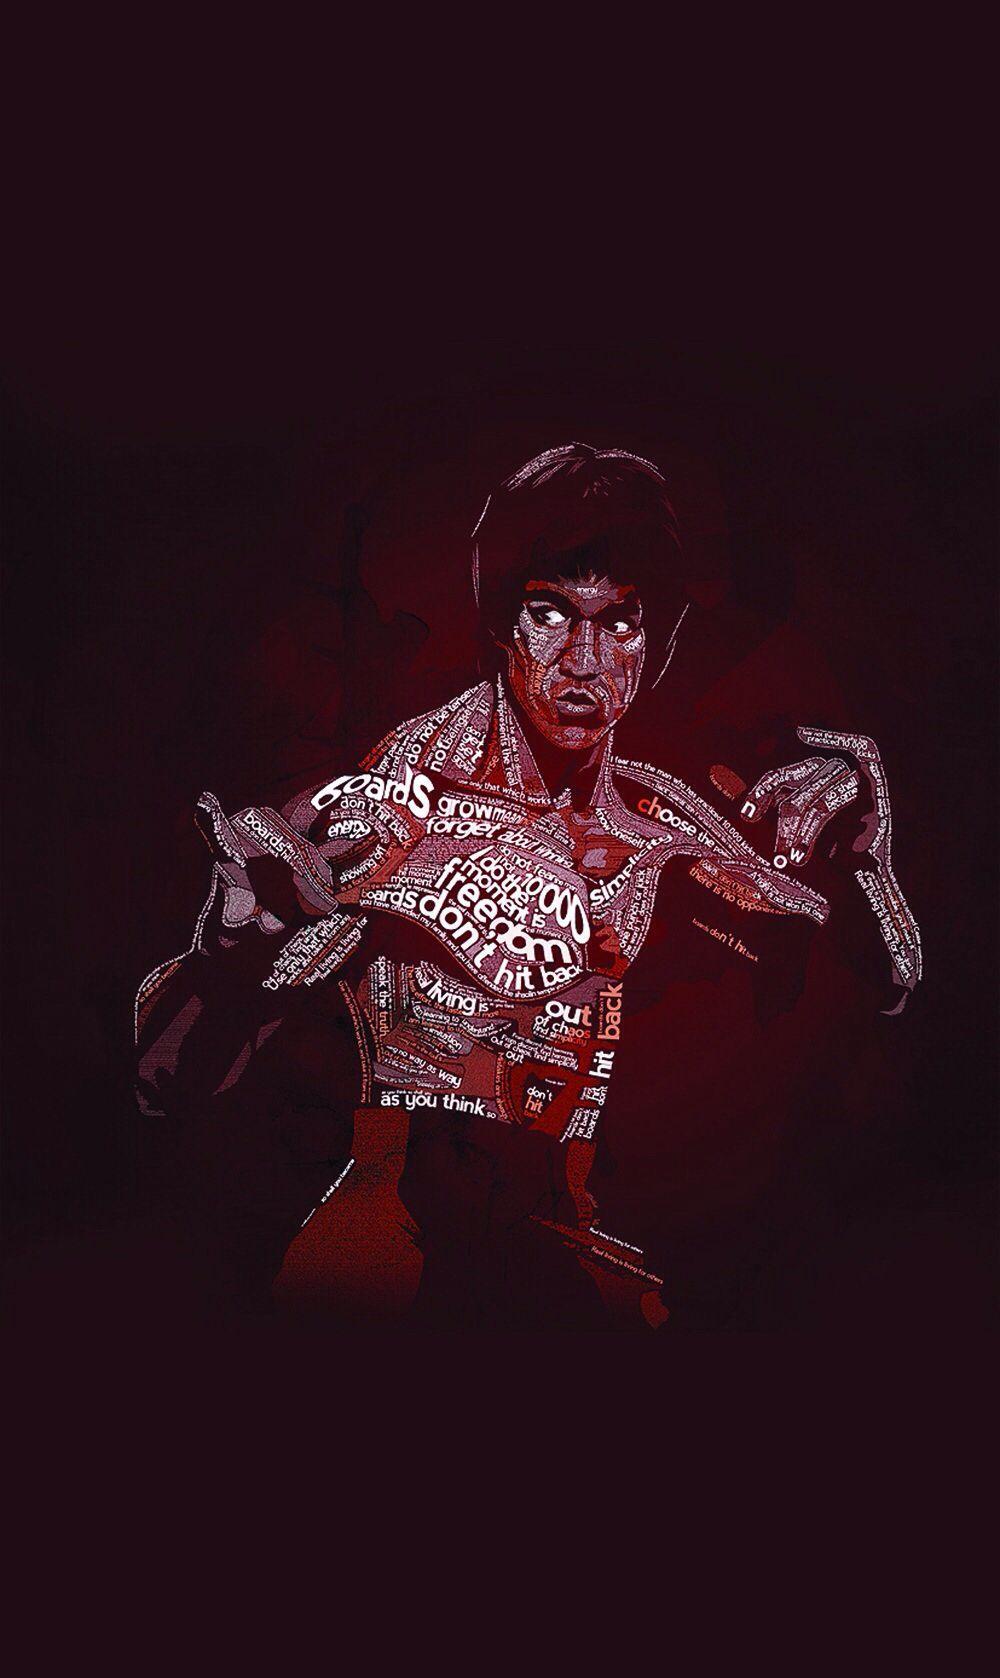 Bruce Lee Quotes Bruce Lee Typographic Portrait Twitter Header Image